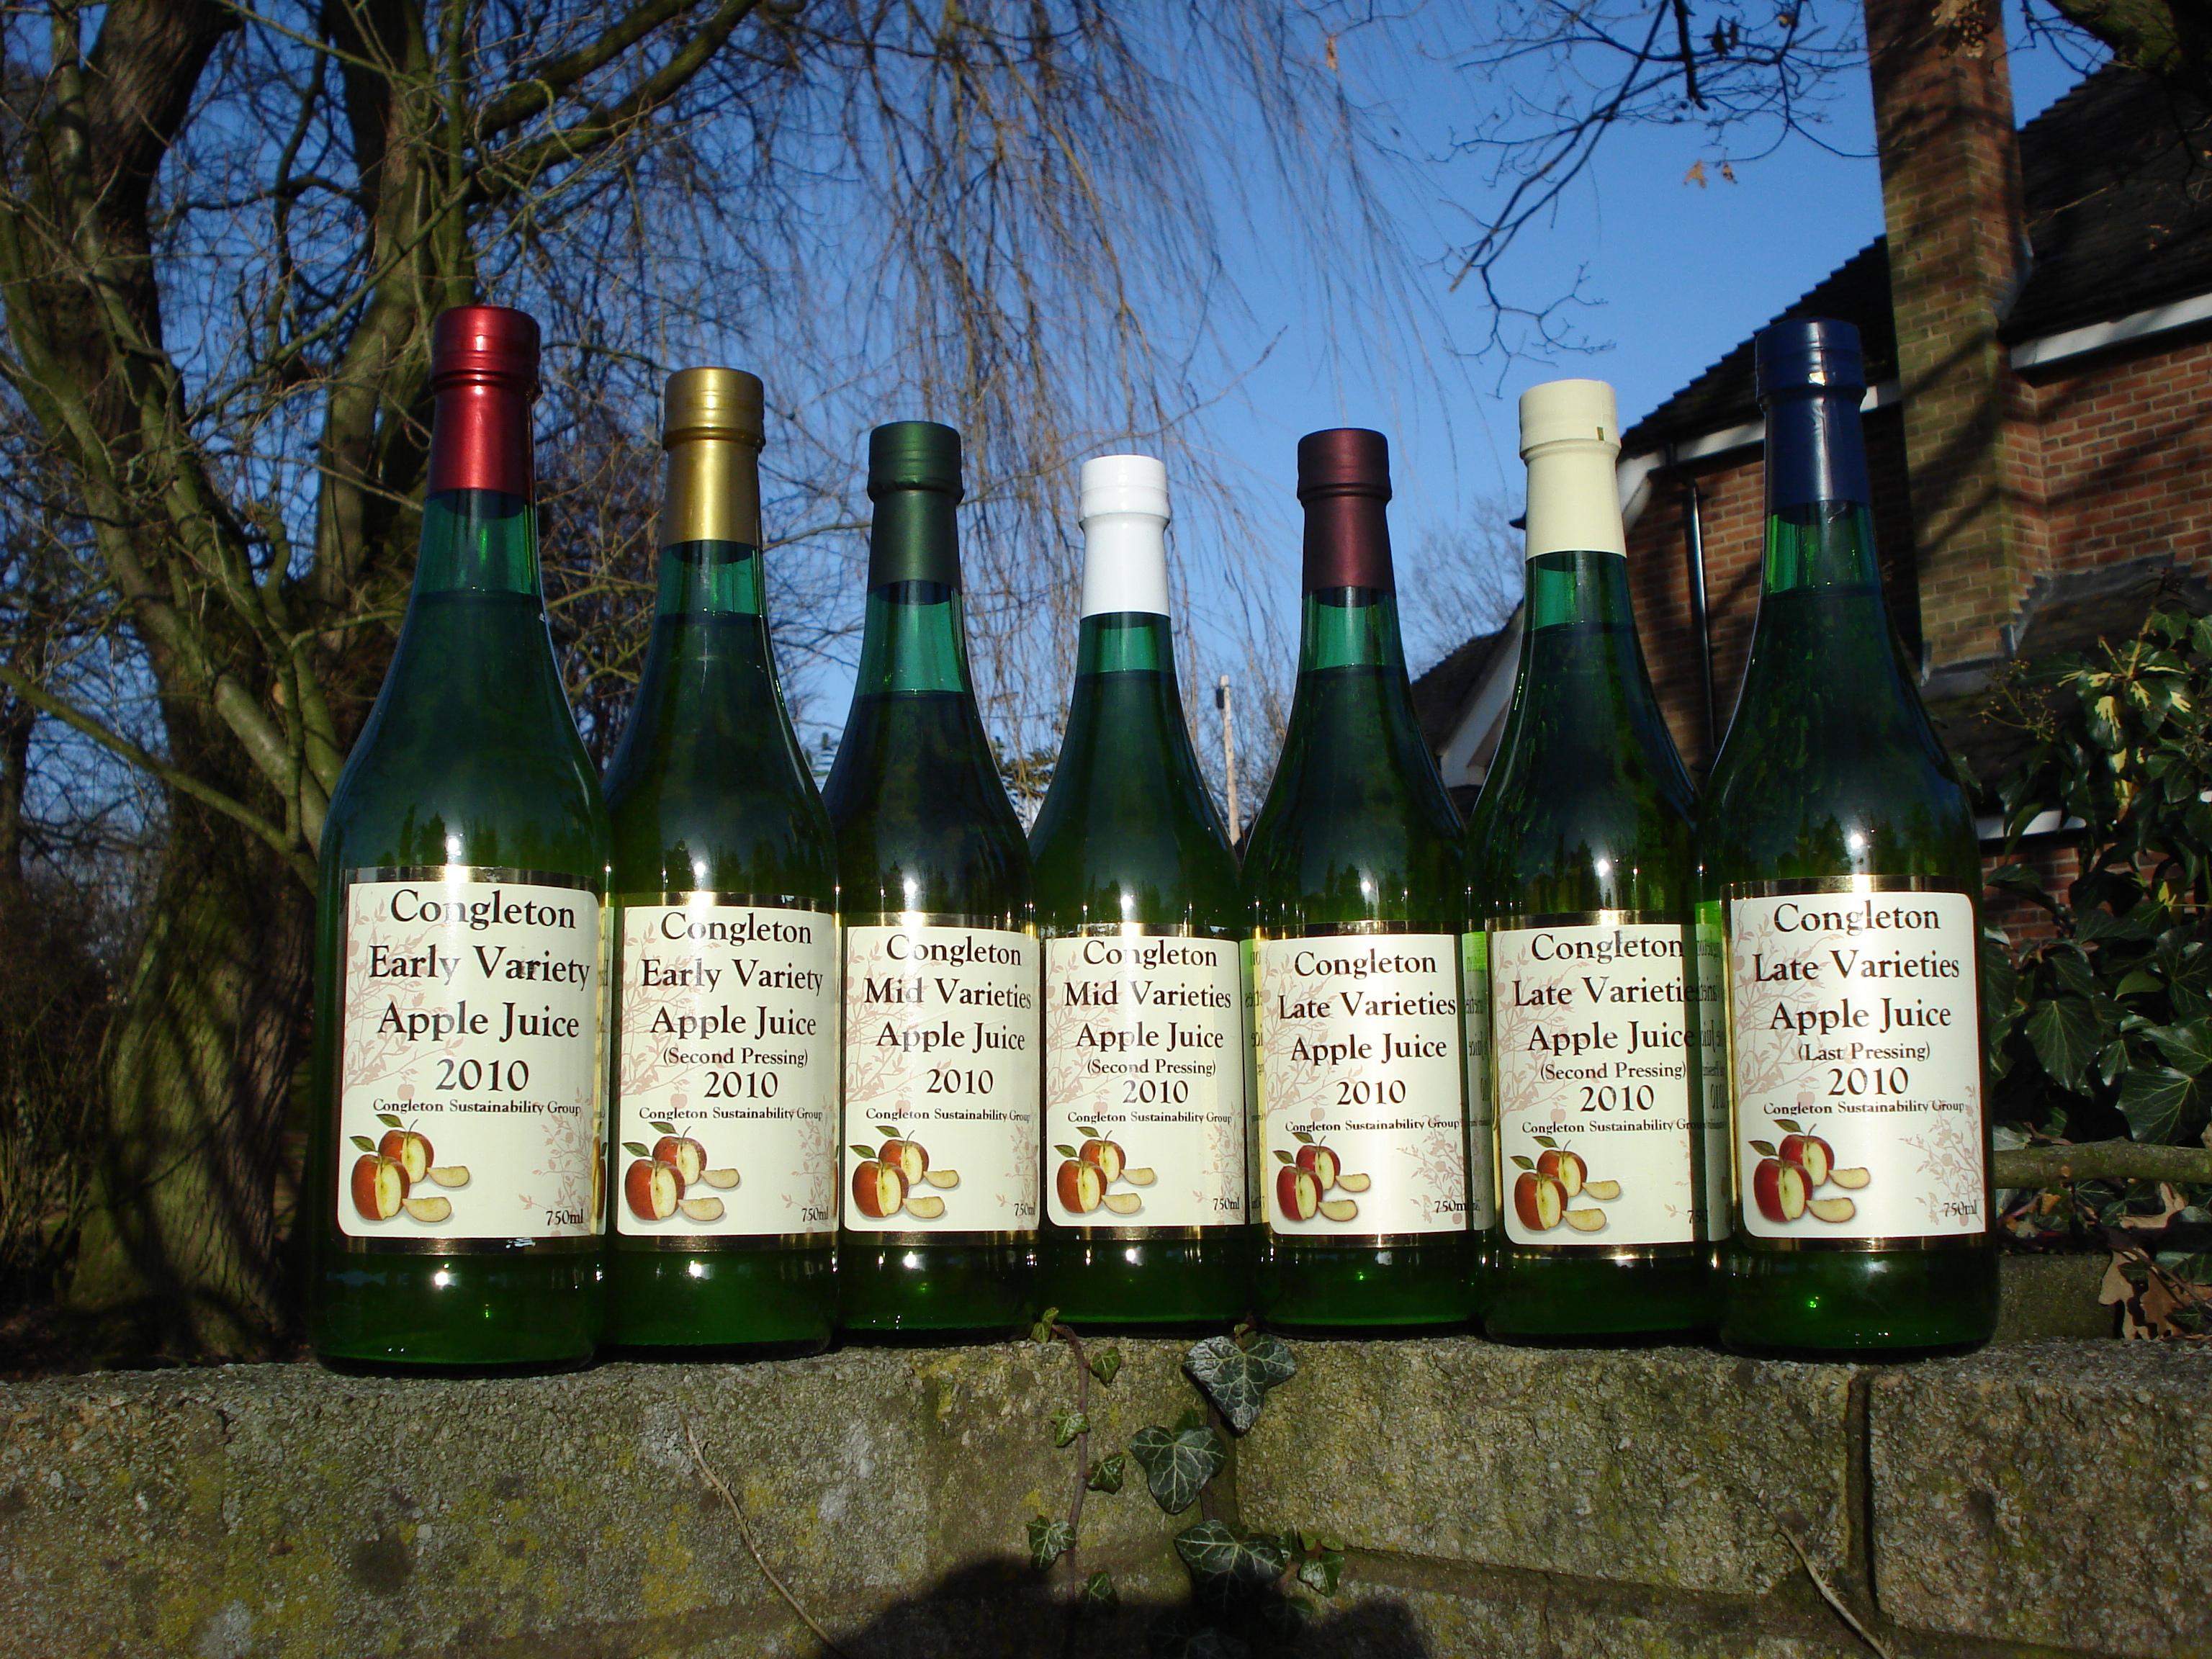 Congleton apple juice is born, the first bottles.